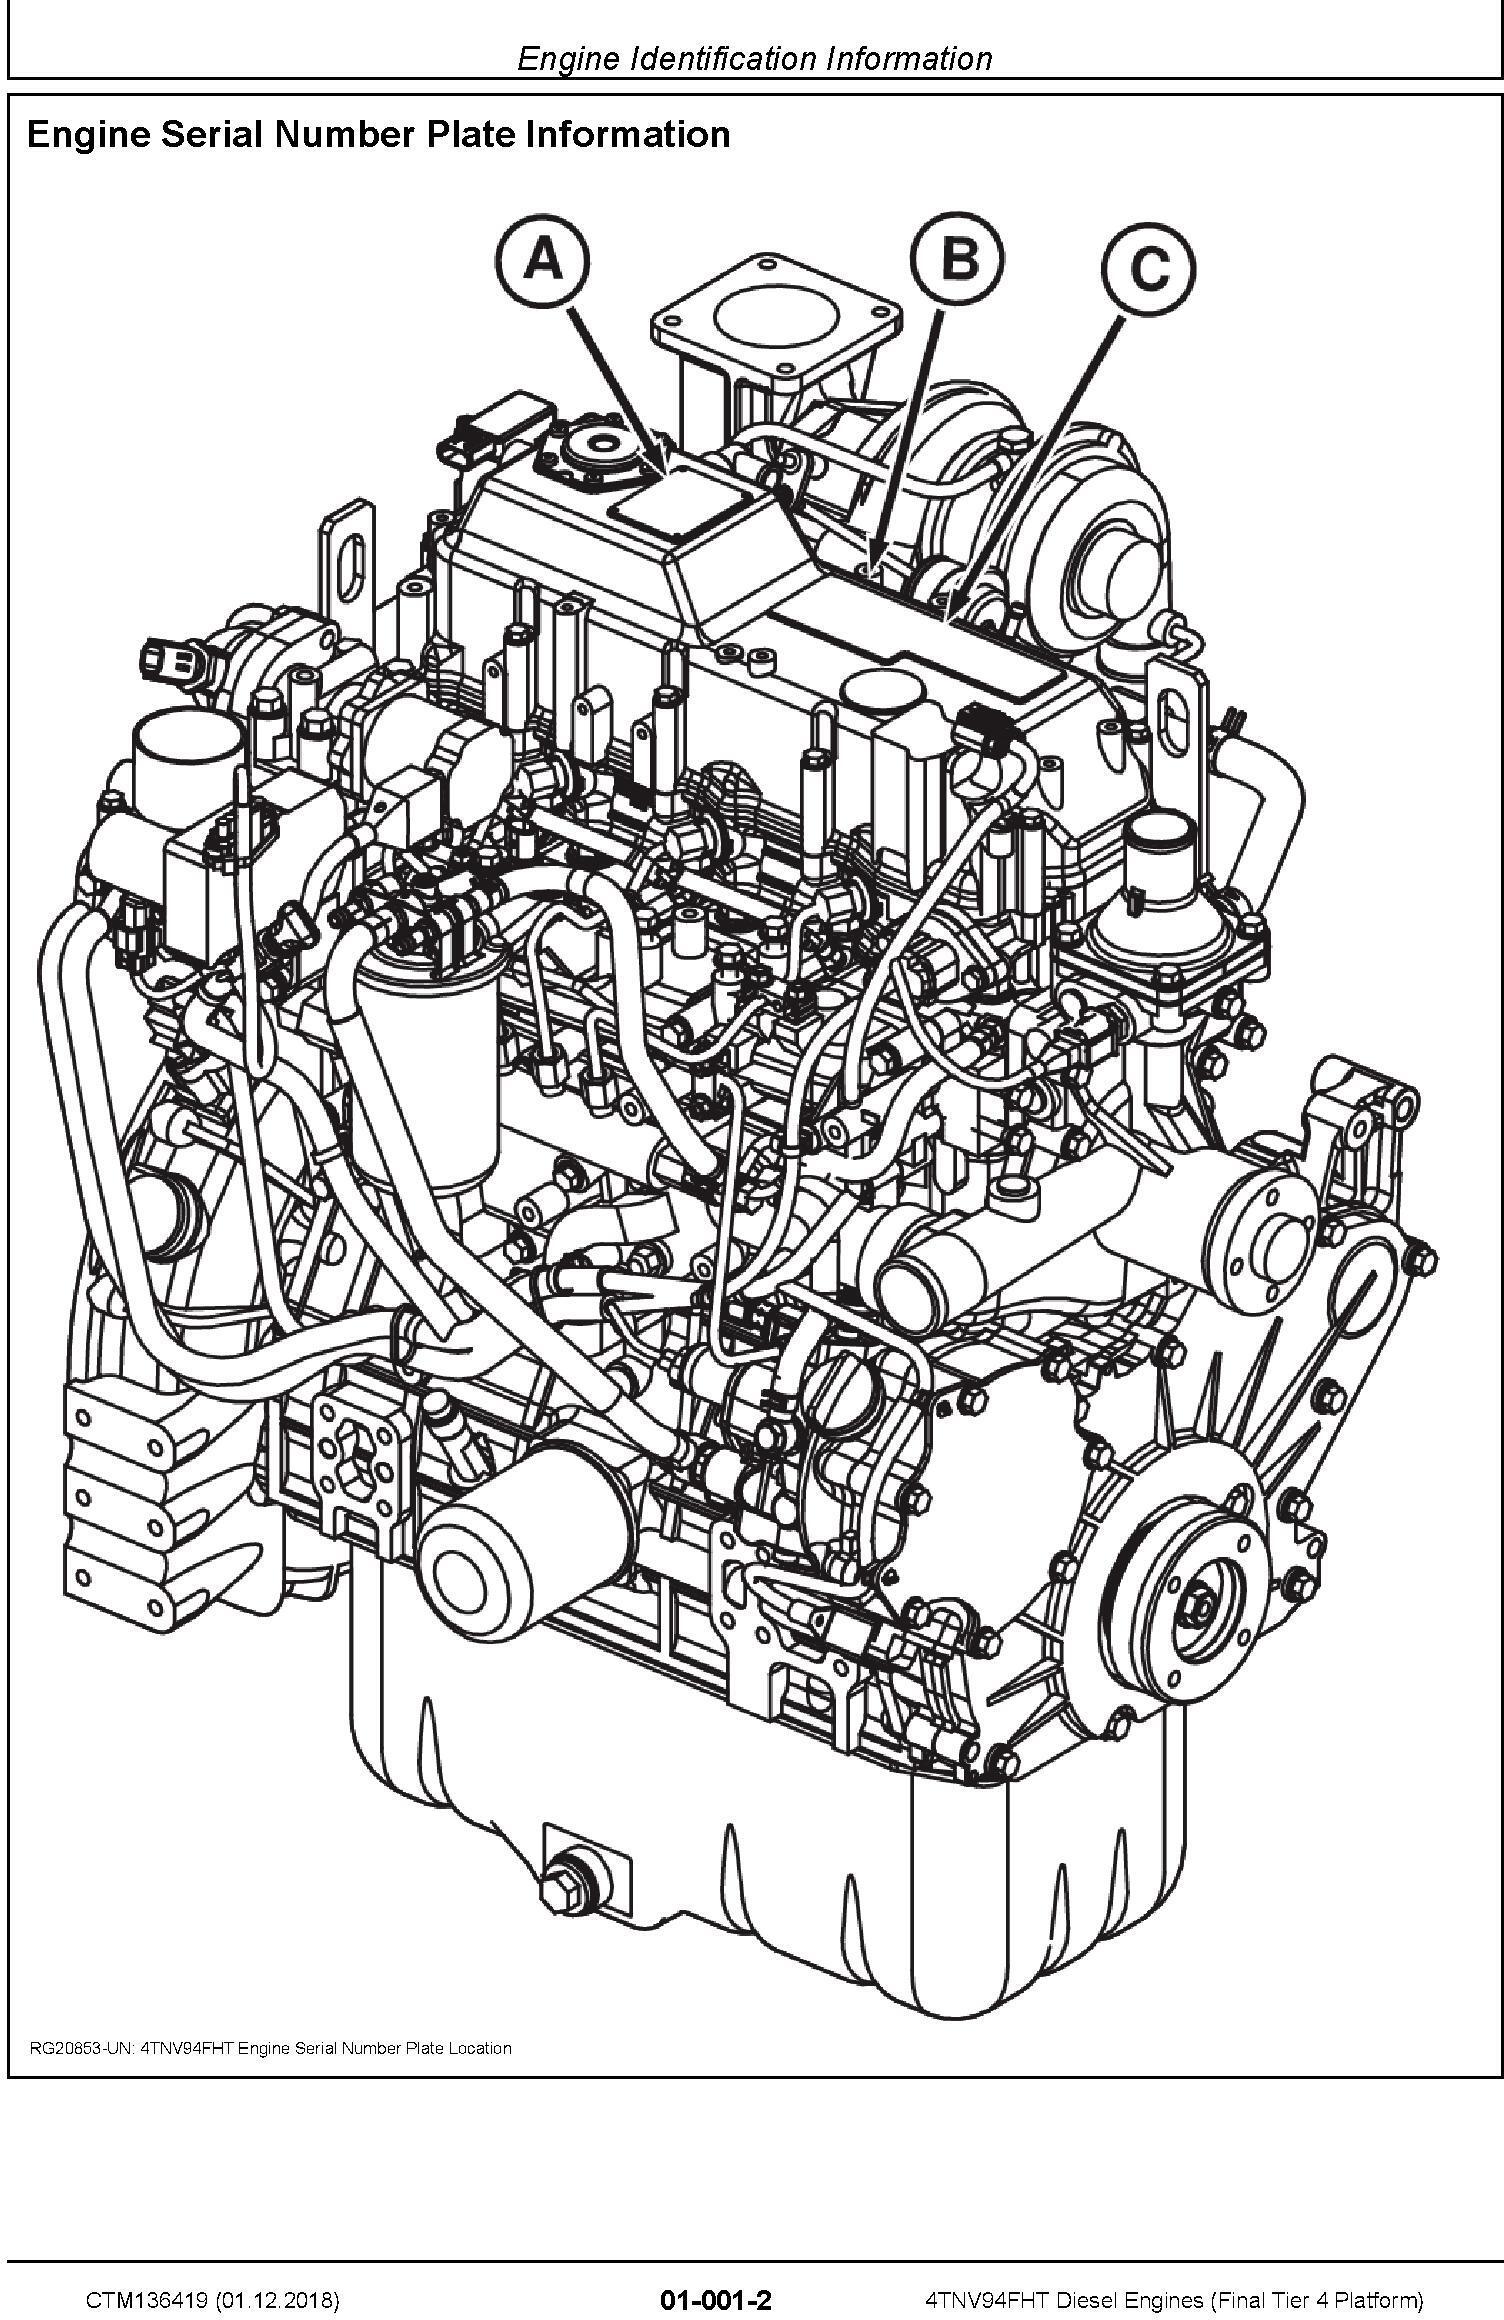 Yanmar 4TNV94FHT Diesel Engines (Final Tier 4 Platform) Technical Service Manual (CTM136419) - 2